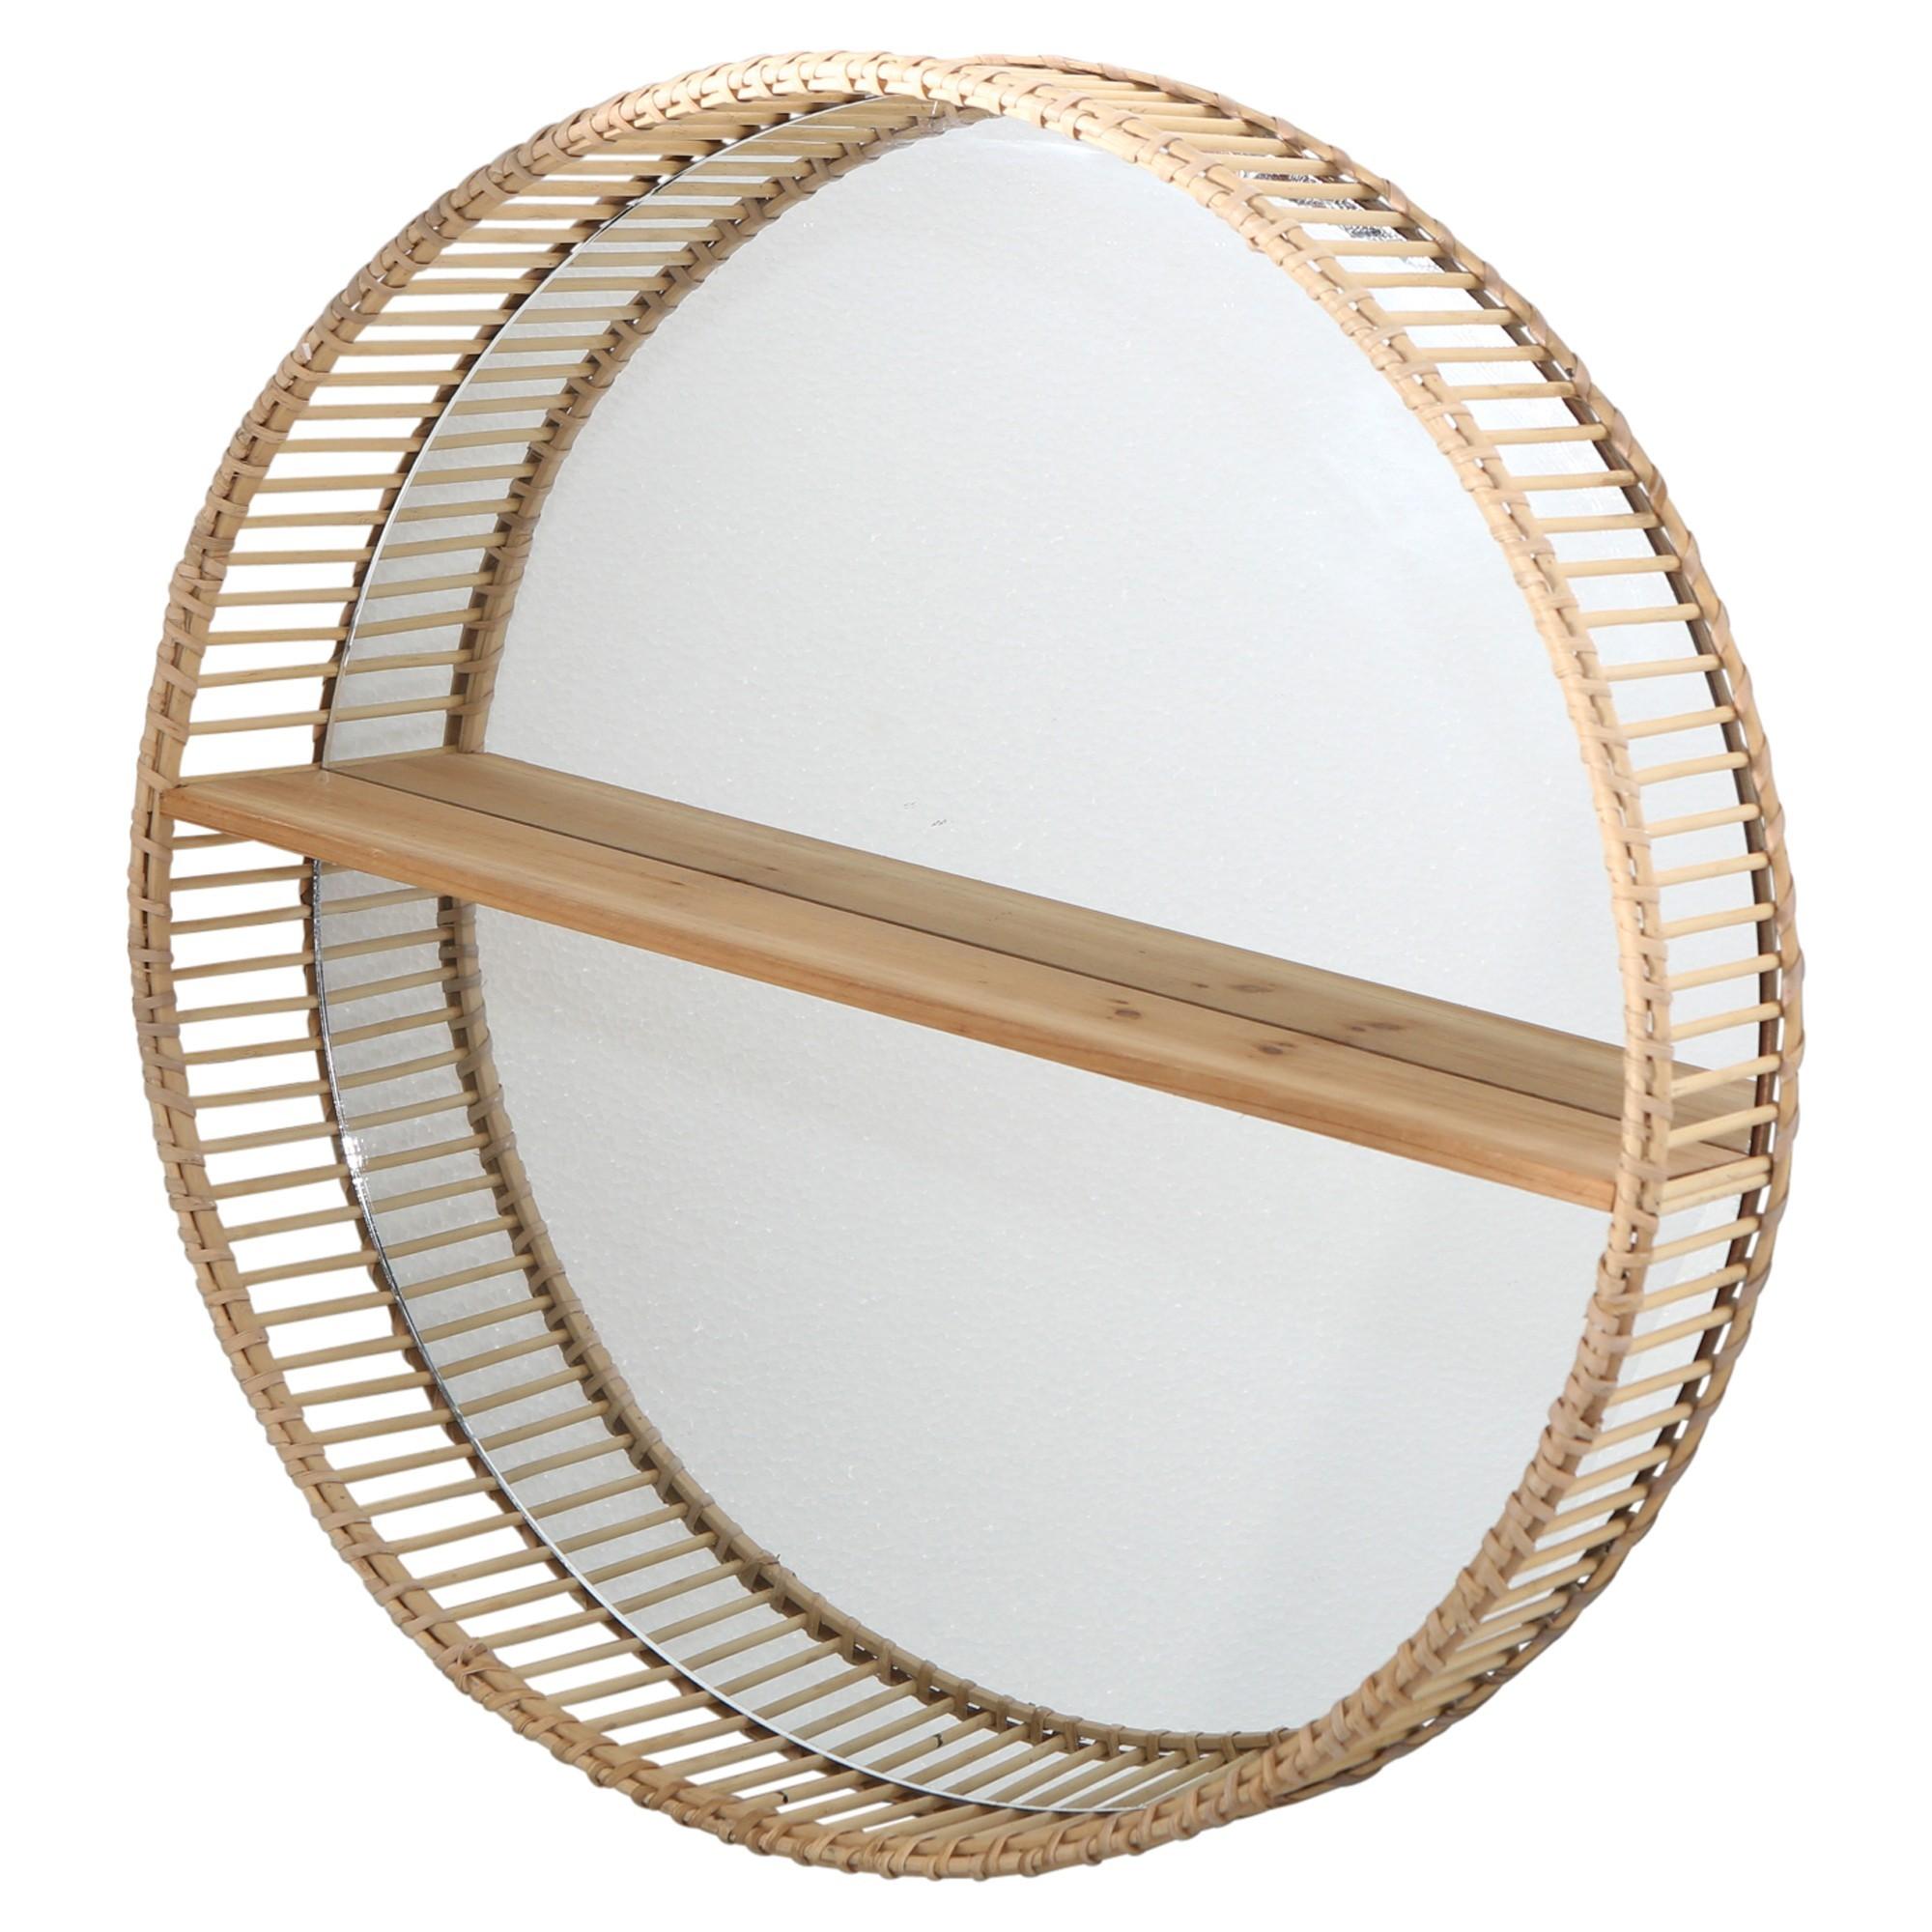 Gary Bamboo Rattan Round Wall Mirror with Shelf, 60cm